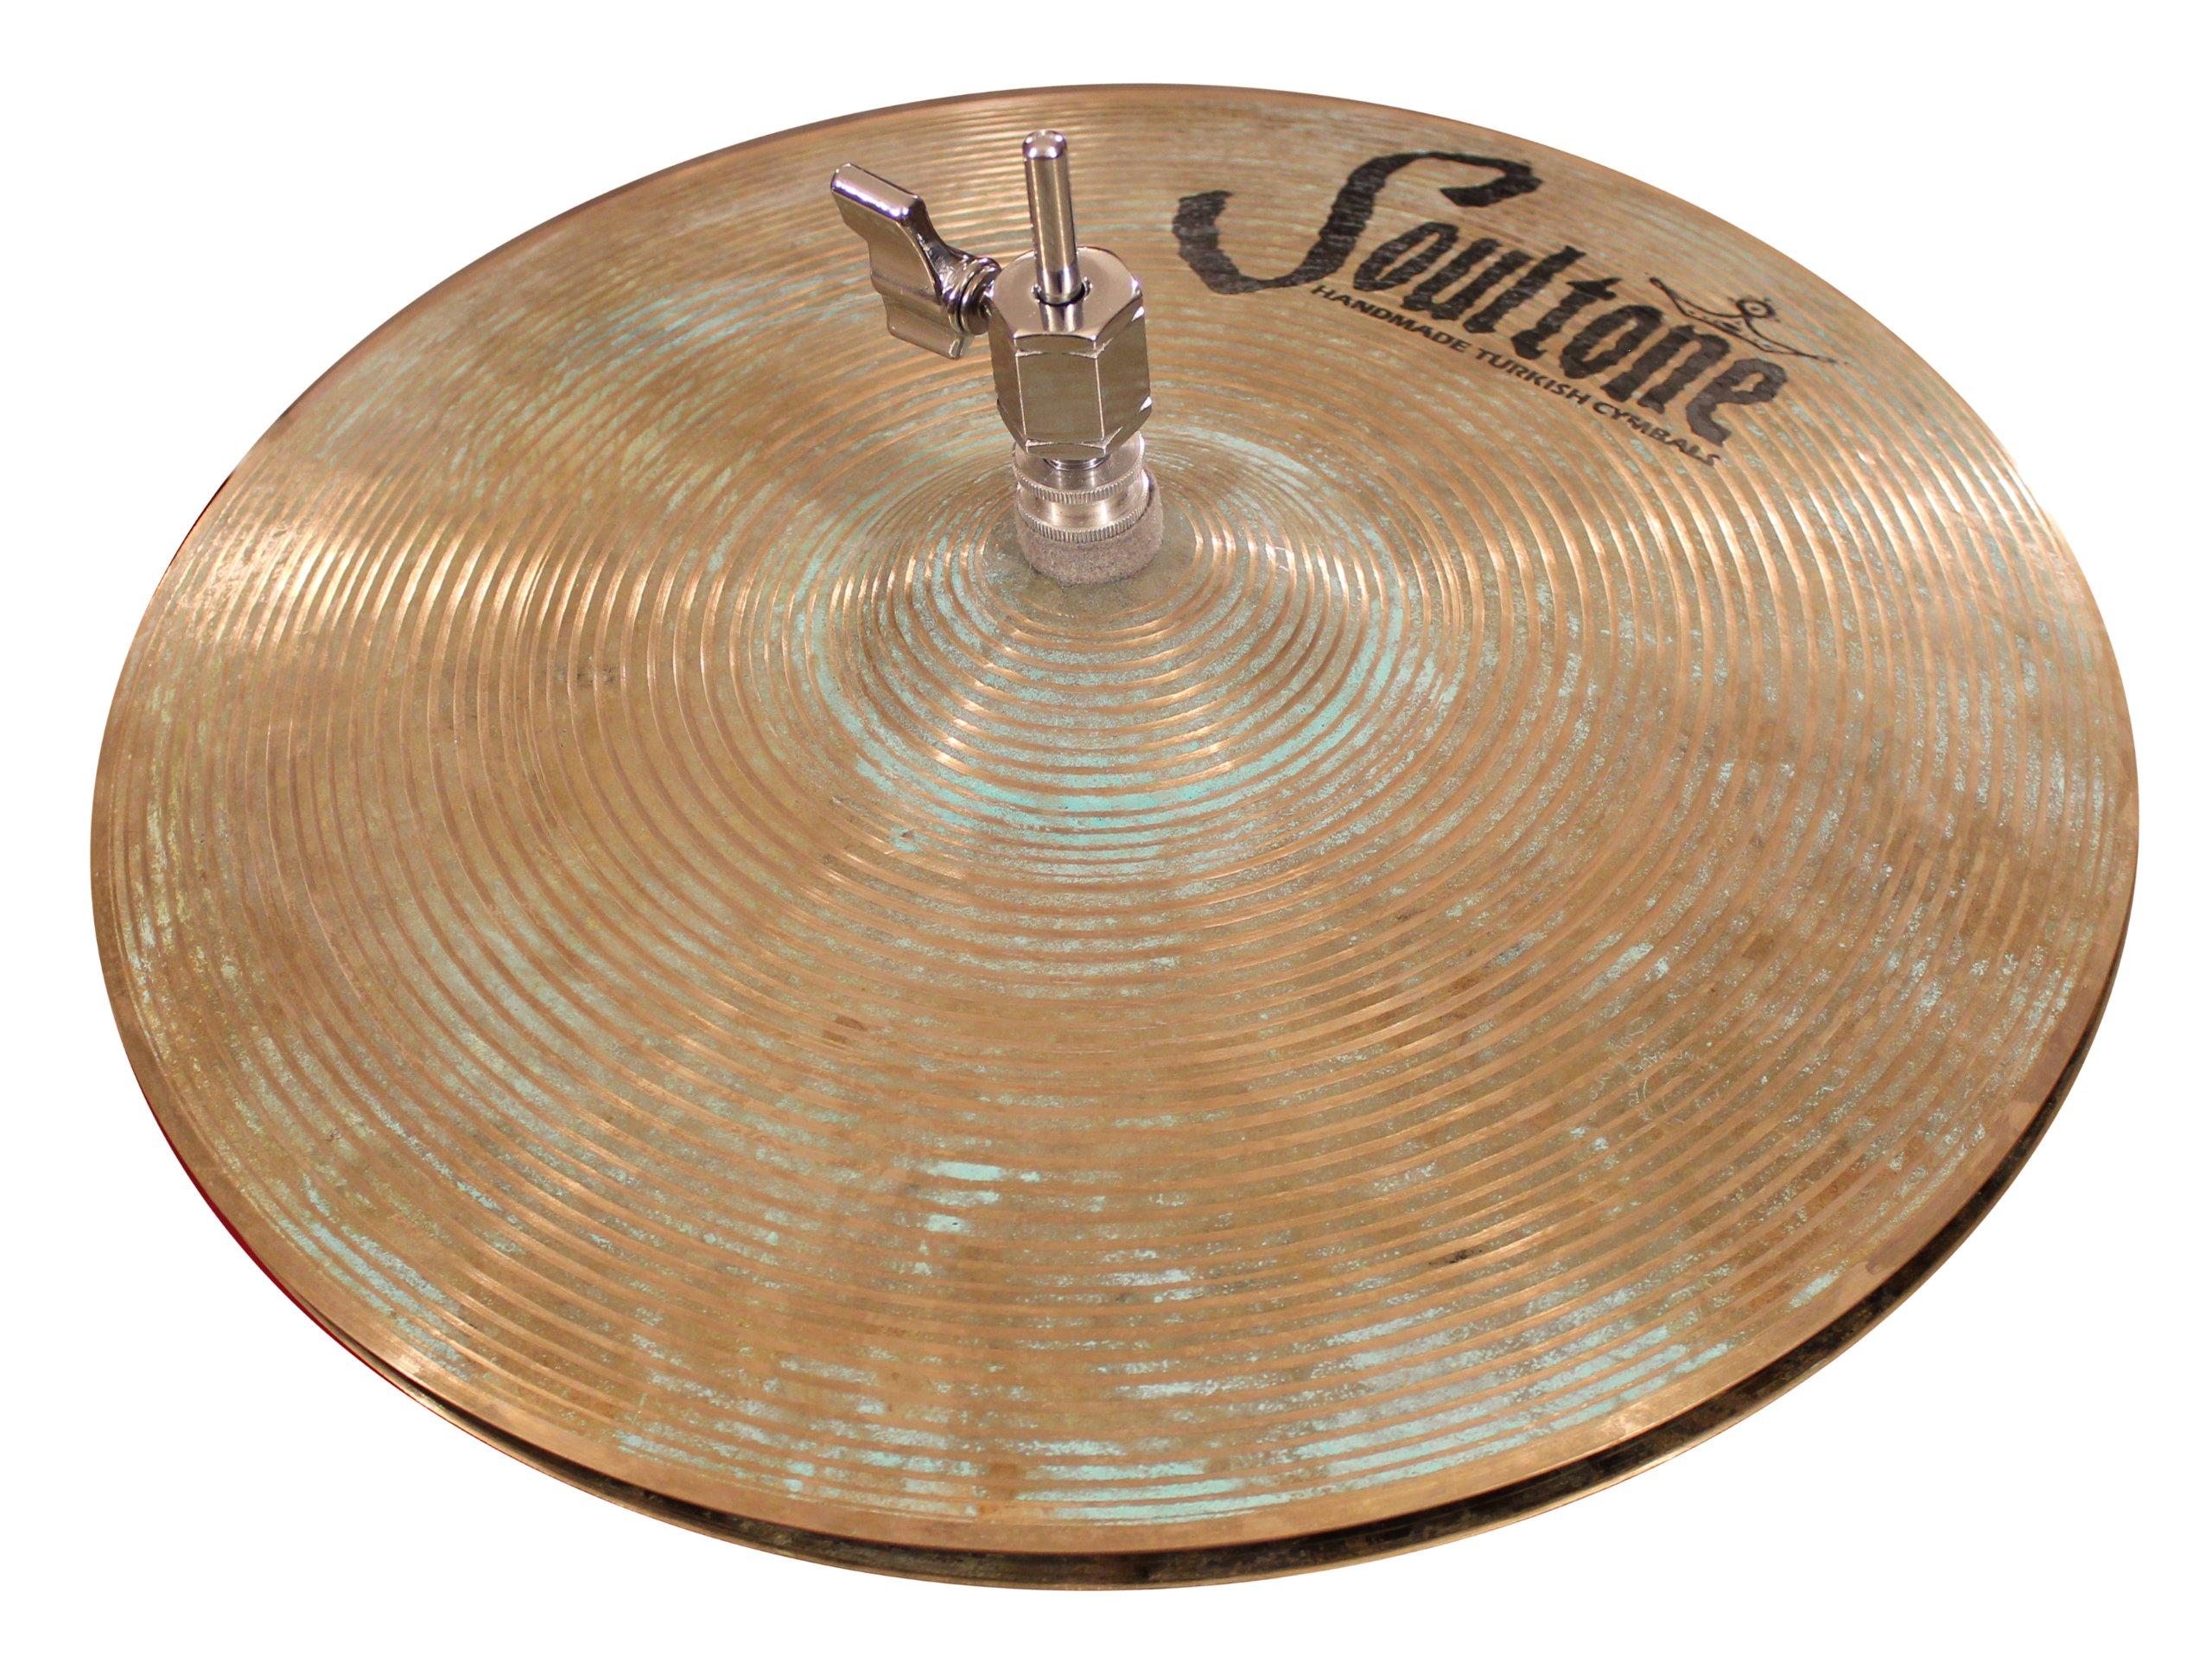 Soultone Cymbals VOSP-HHT15-15'' Vintage Old School Patina Hi Hats Pair by Soultone Cymbals